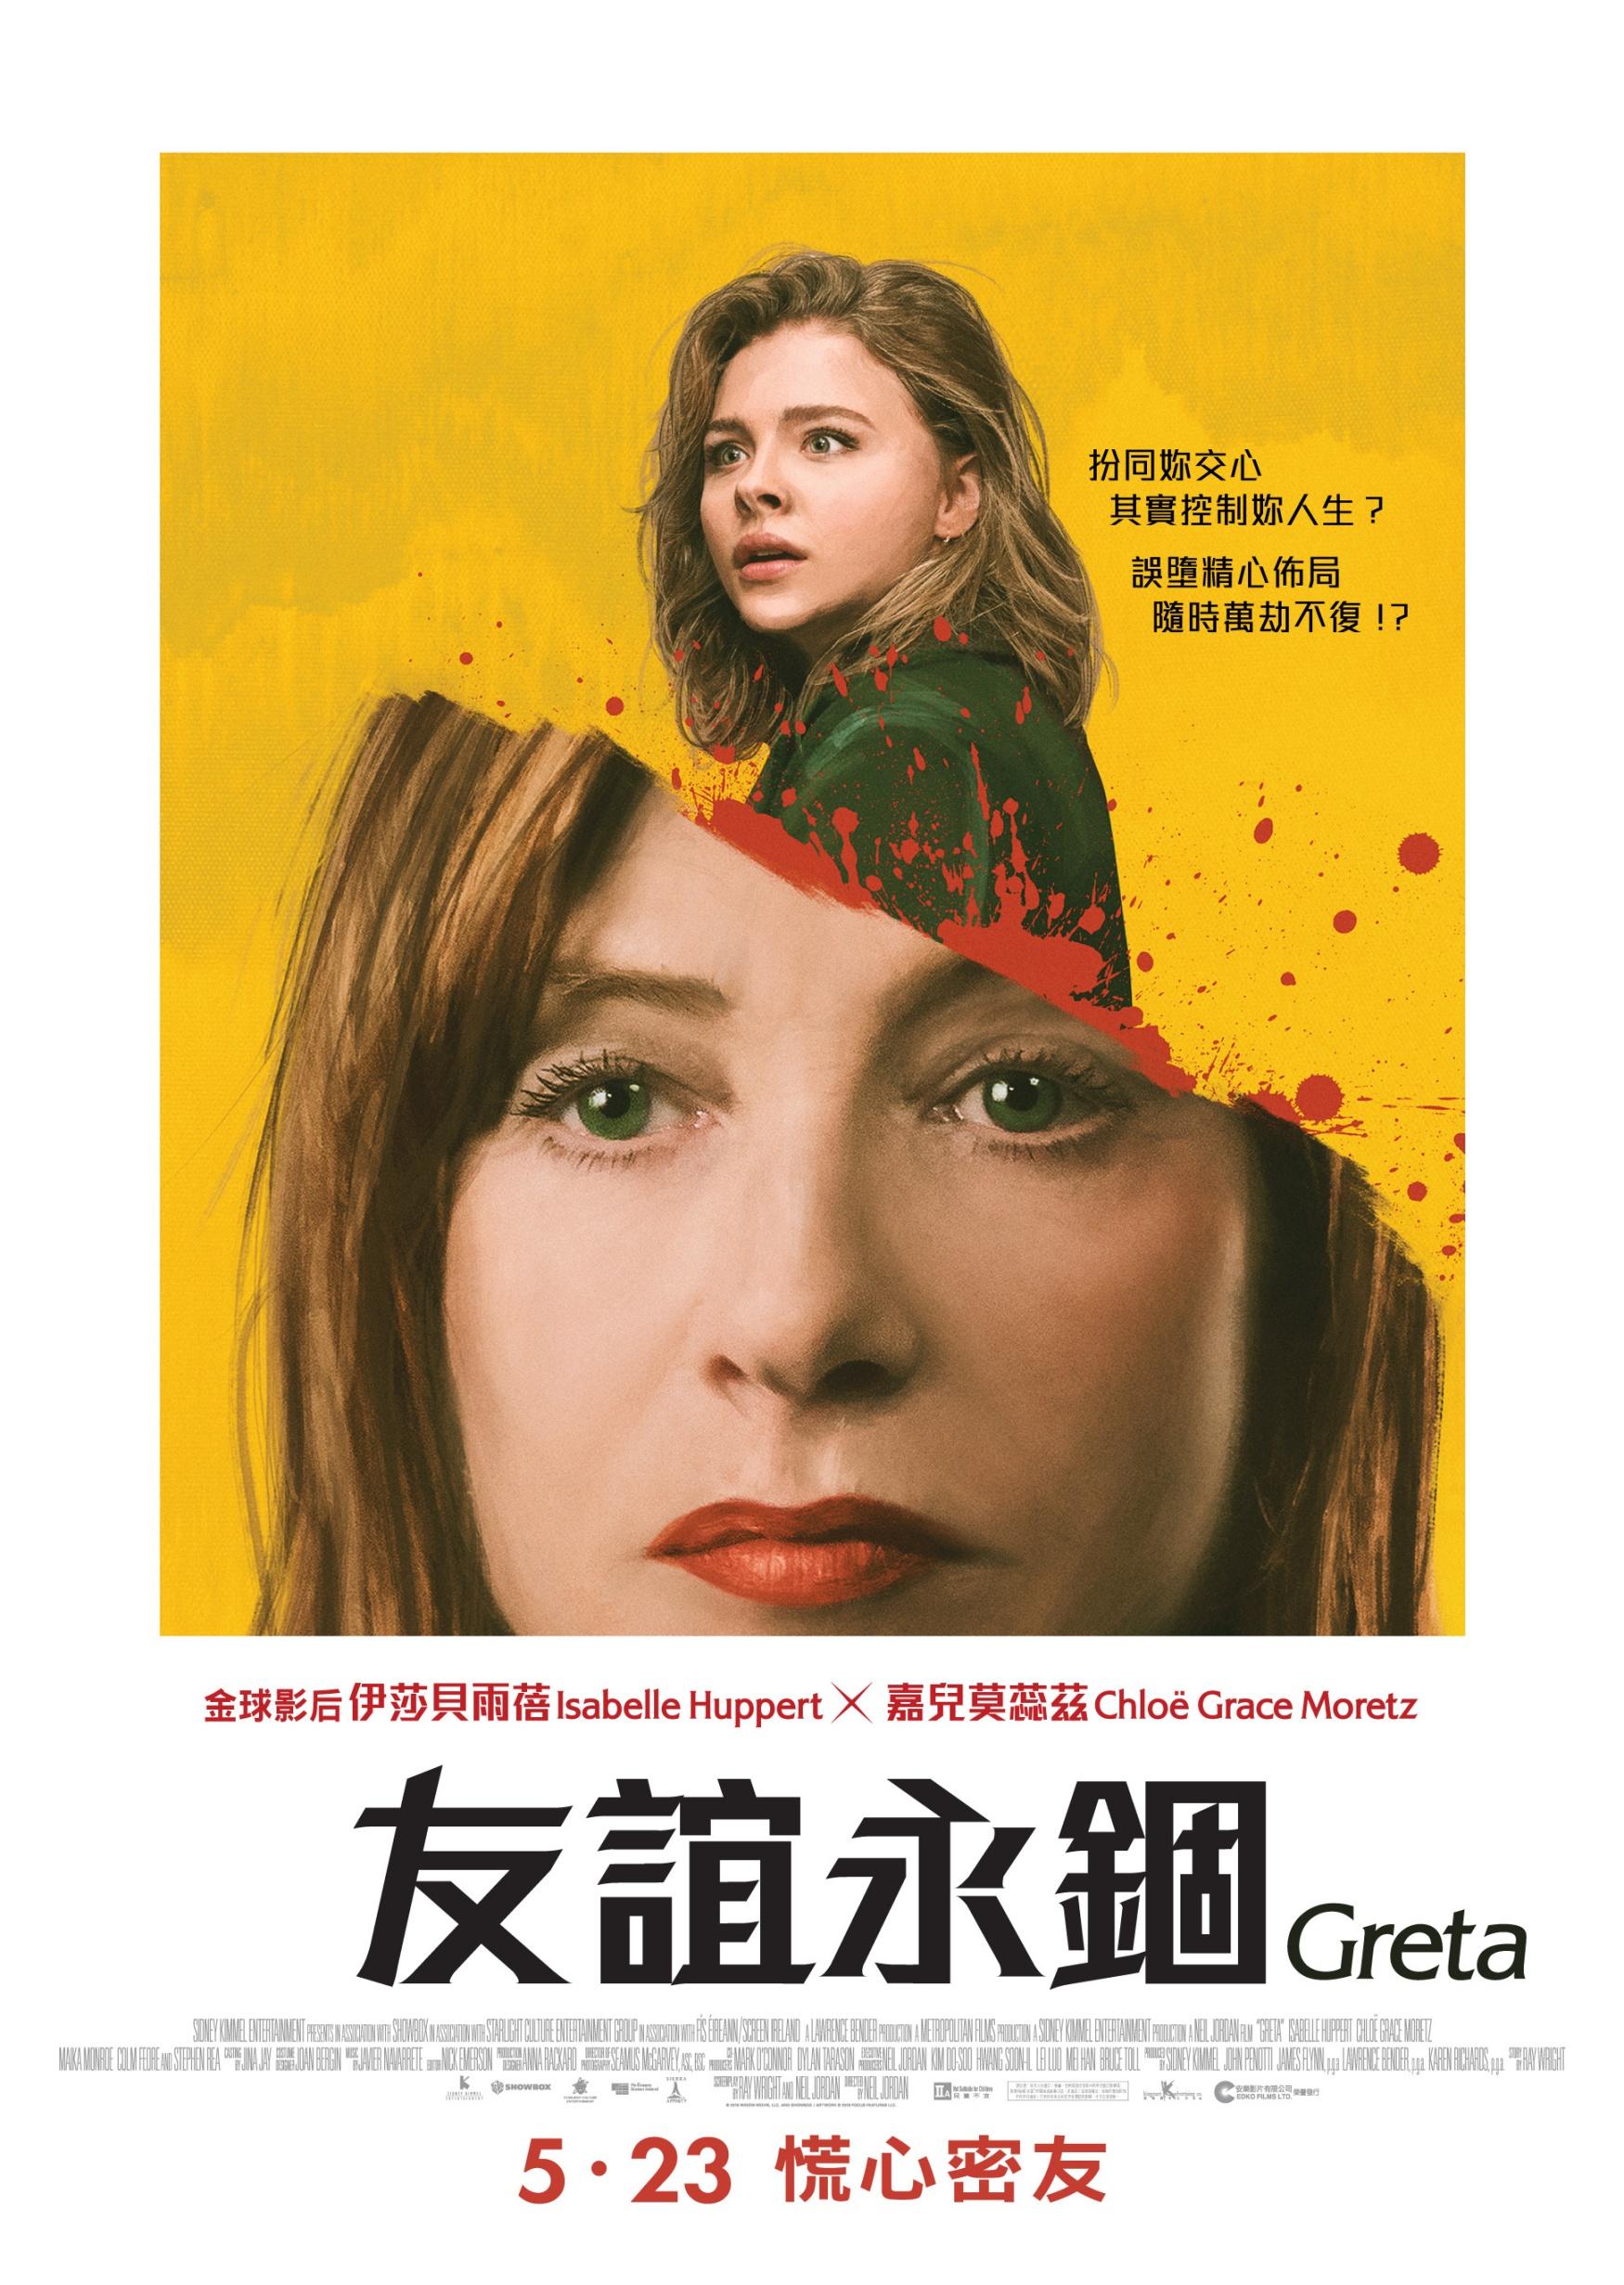 20190506_Greta_Poster.jpg